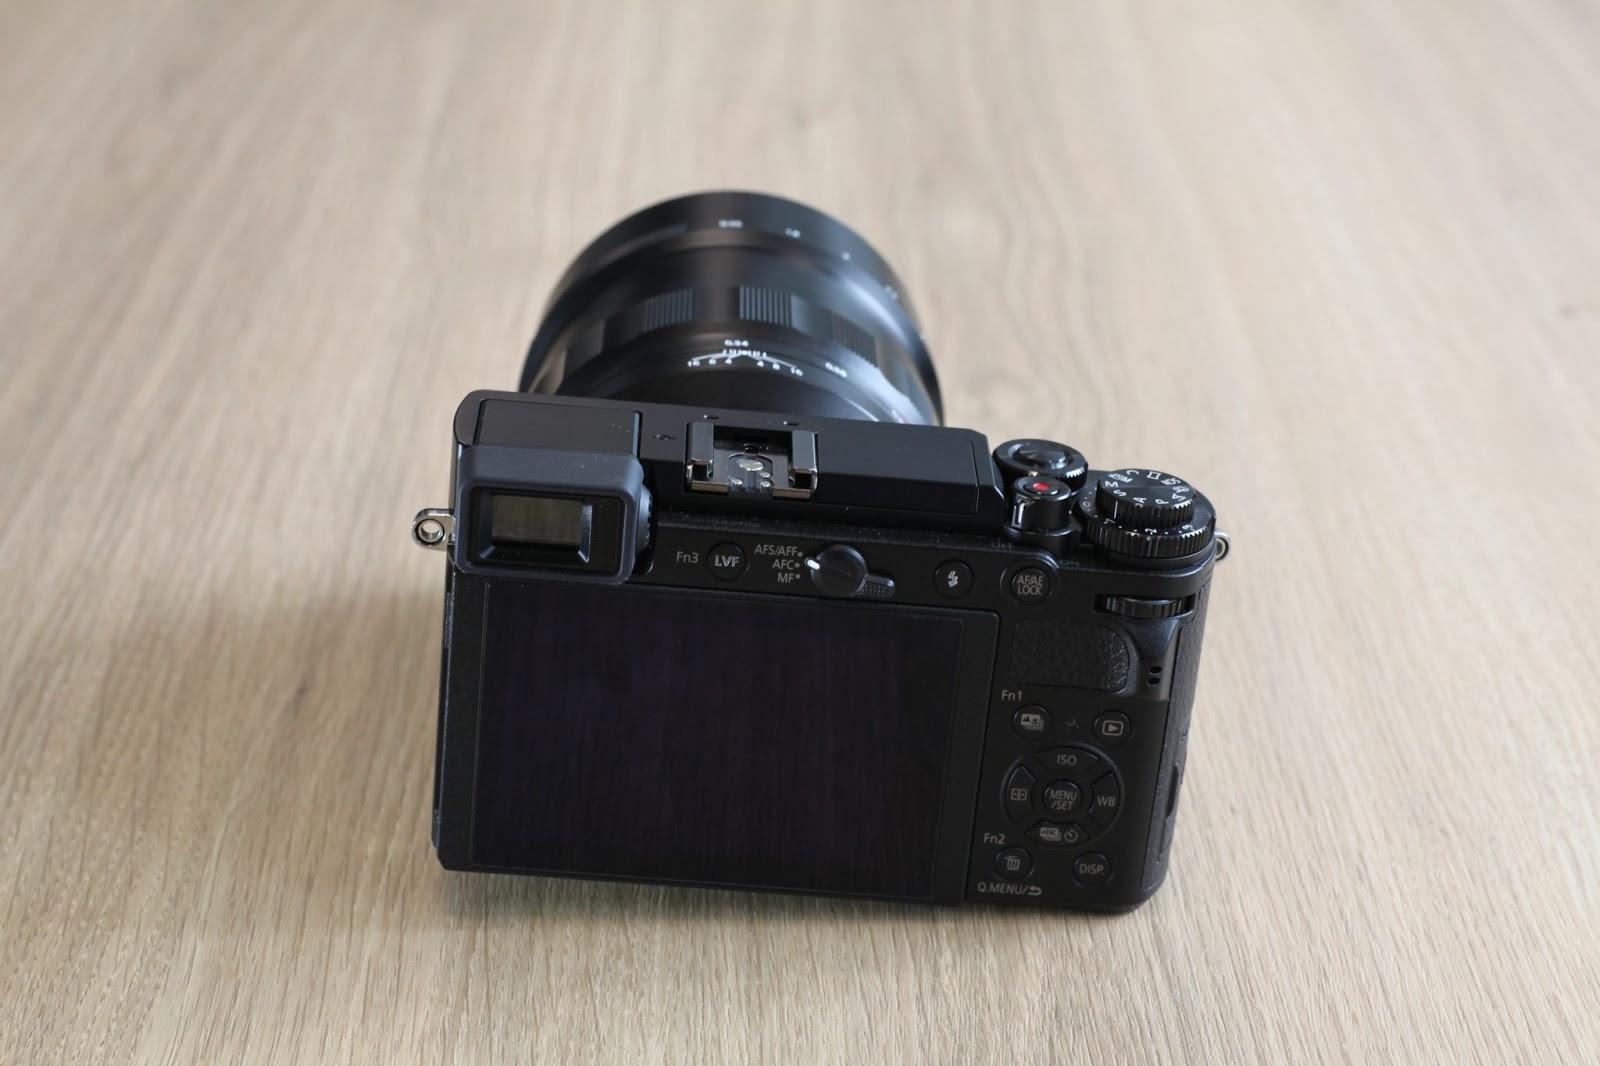 Voigtlander Nokton 60mm f/0.95 и Panasonic Lumix GX7 Mark III (GX9)